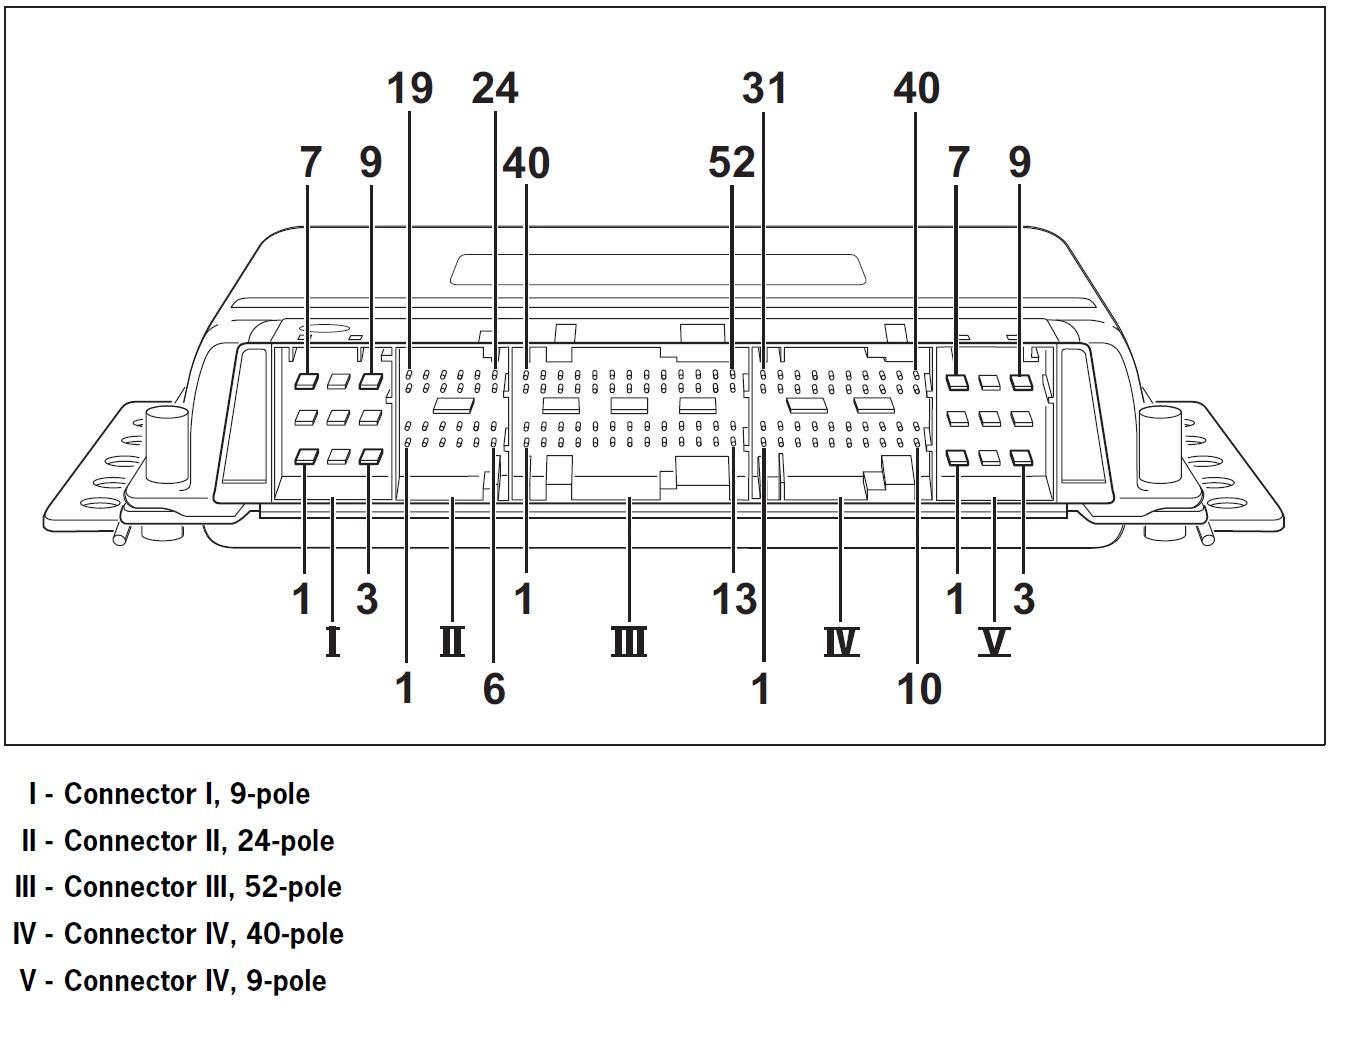 Porsche 997 1 Turbo Dme Pinout Ecu Pinout Cable And